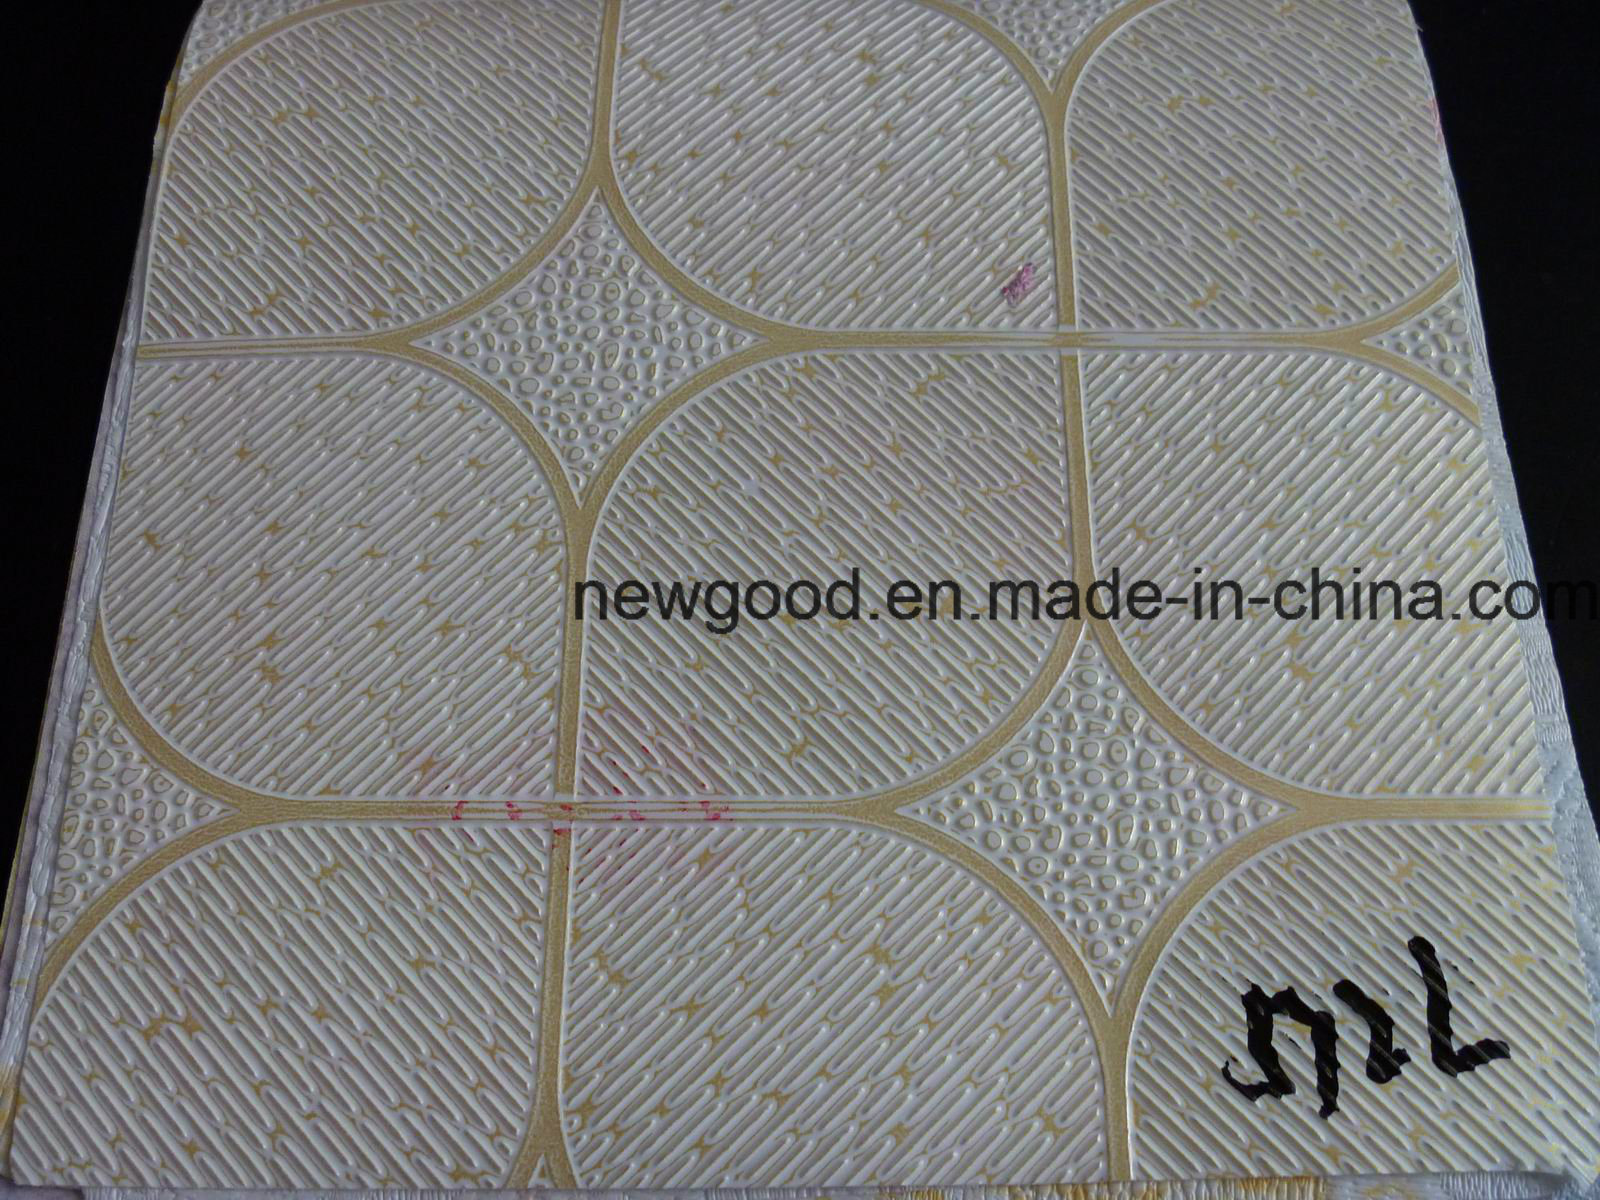 China Ceiling Tiles Gypsum Ceiling Tiles Pvc Laminate Gypsum